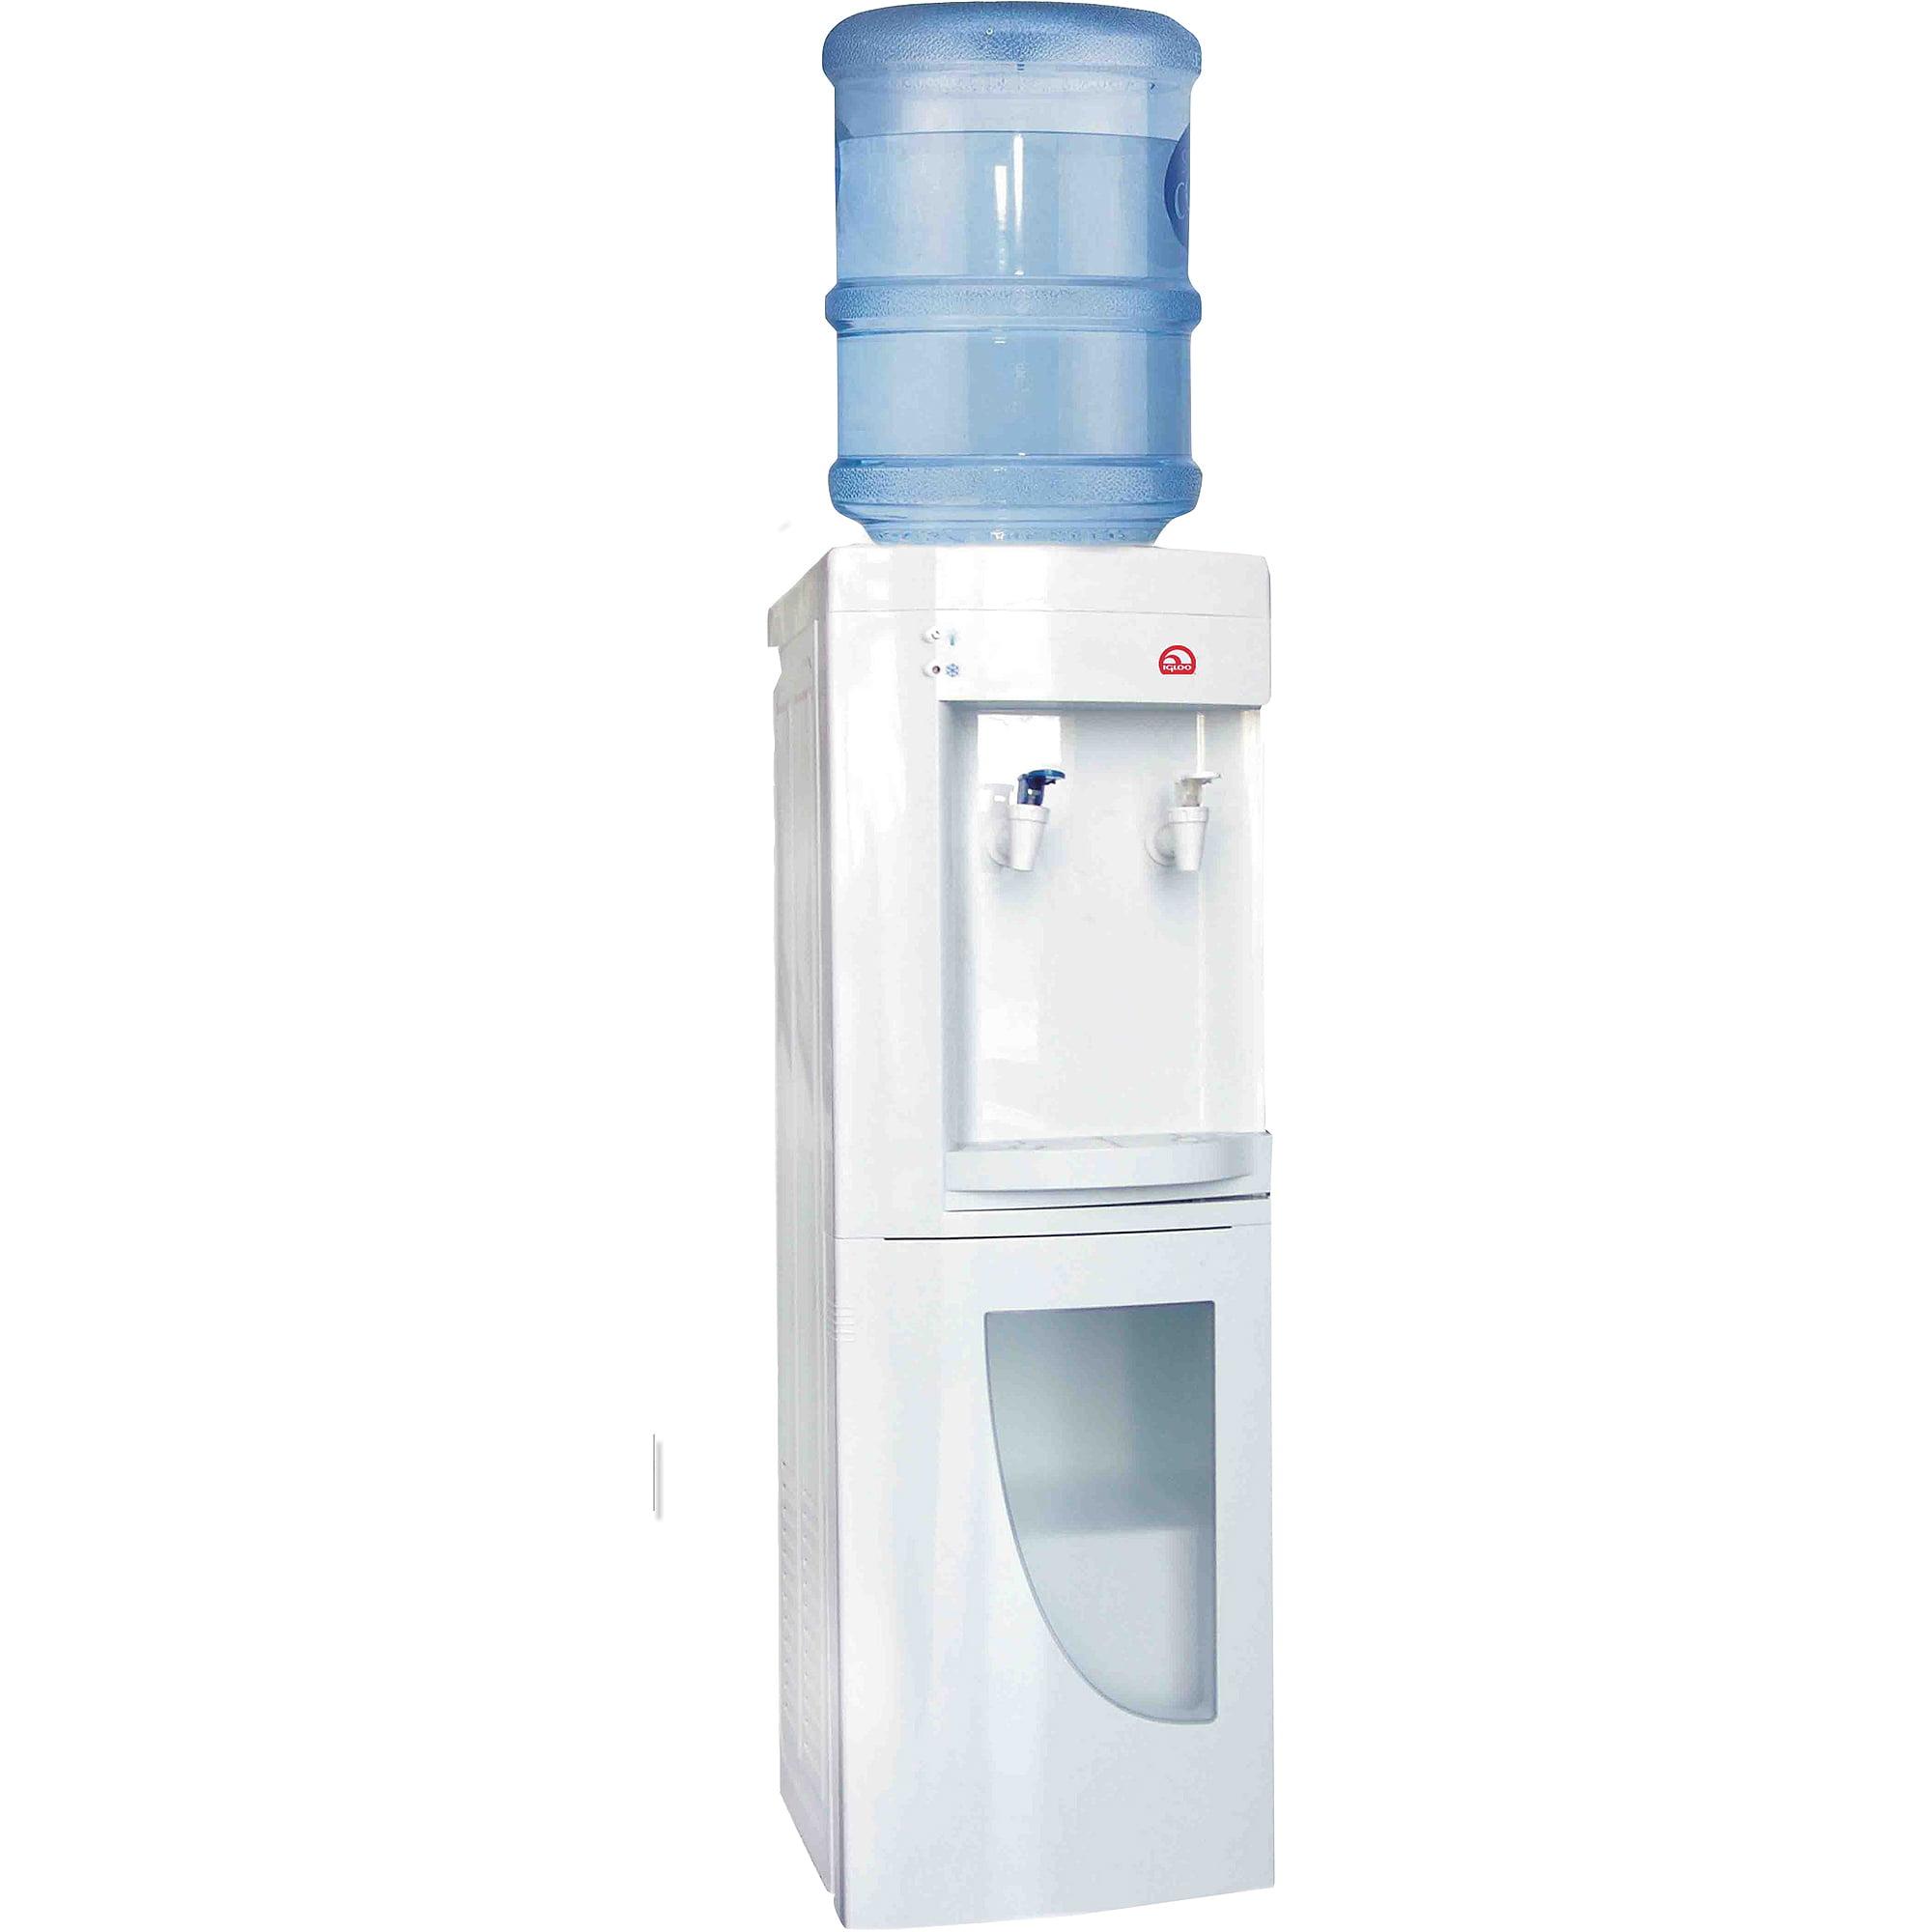 Hot And Cold Water Cooler Dispenser Igloo Water Cooler Dispenser White Walmartcom